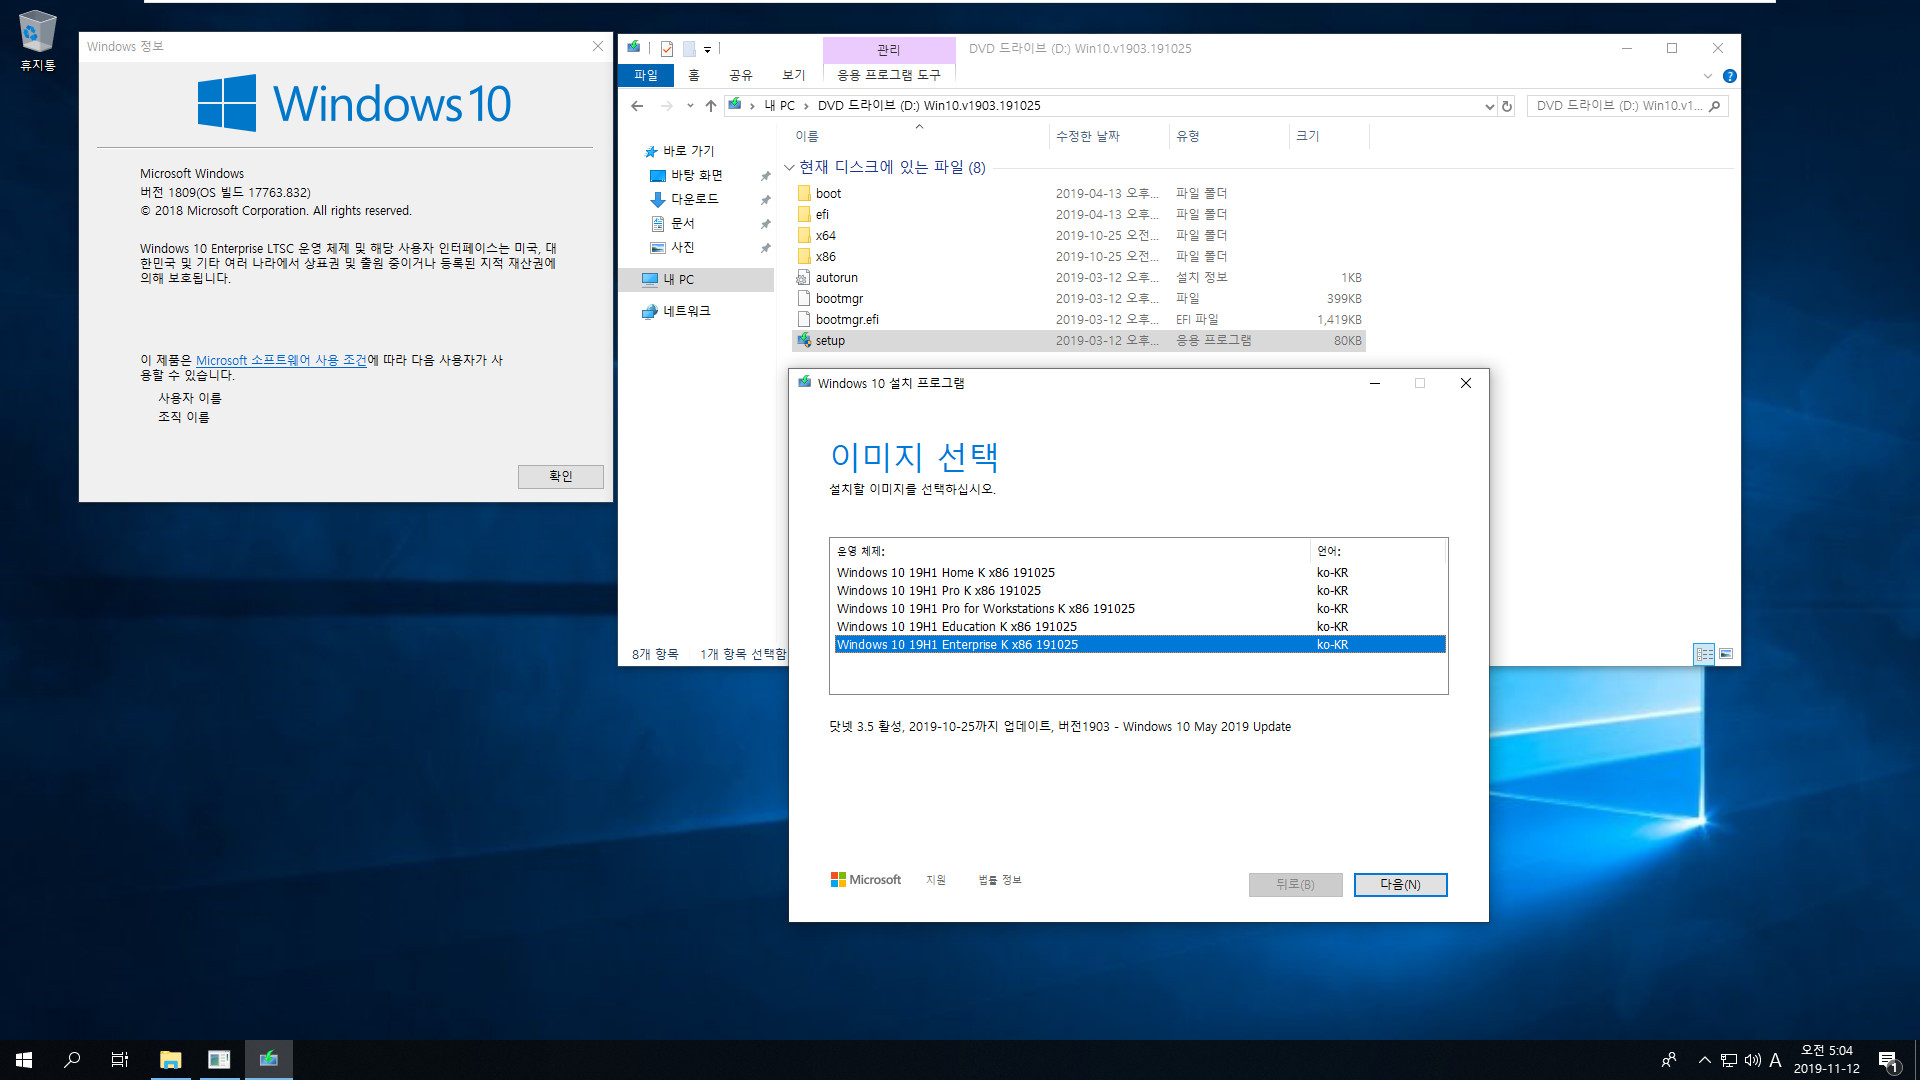 Windows 10 Enterprise LTSC [2019] (버전 1809) 를 버전 1903 프로로 업그레이드 설치하기 - 우선 설정과 앱 유지를 위해서 버전 1903 Enterprise로 업그레이드 한 후에 버전 1903 Pro로 변경하면 됩니다 2019-11-12_050406.jpg